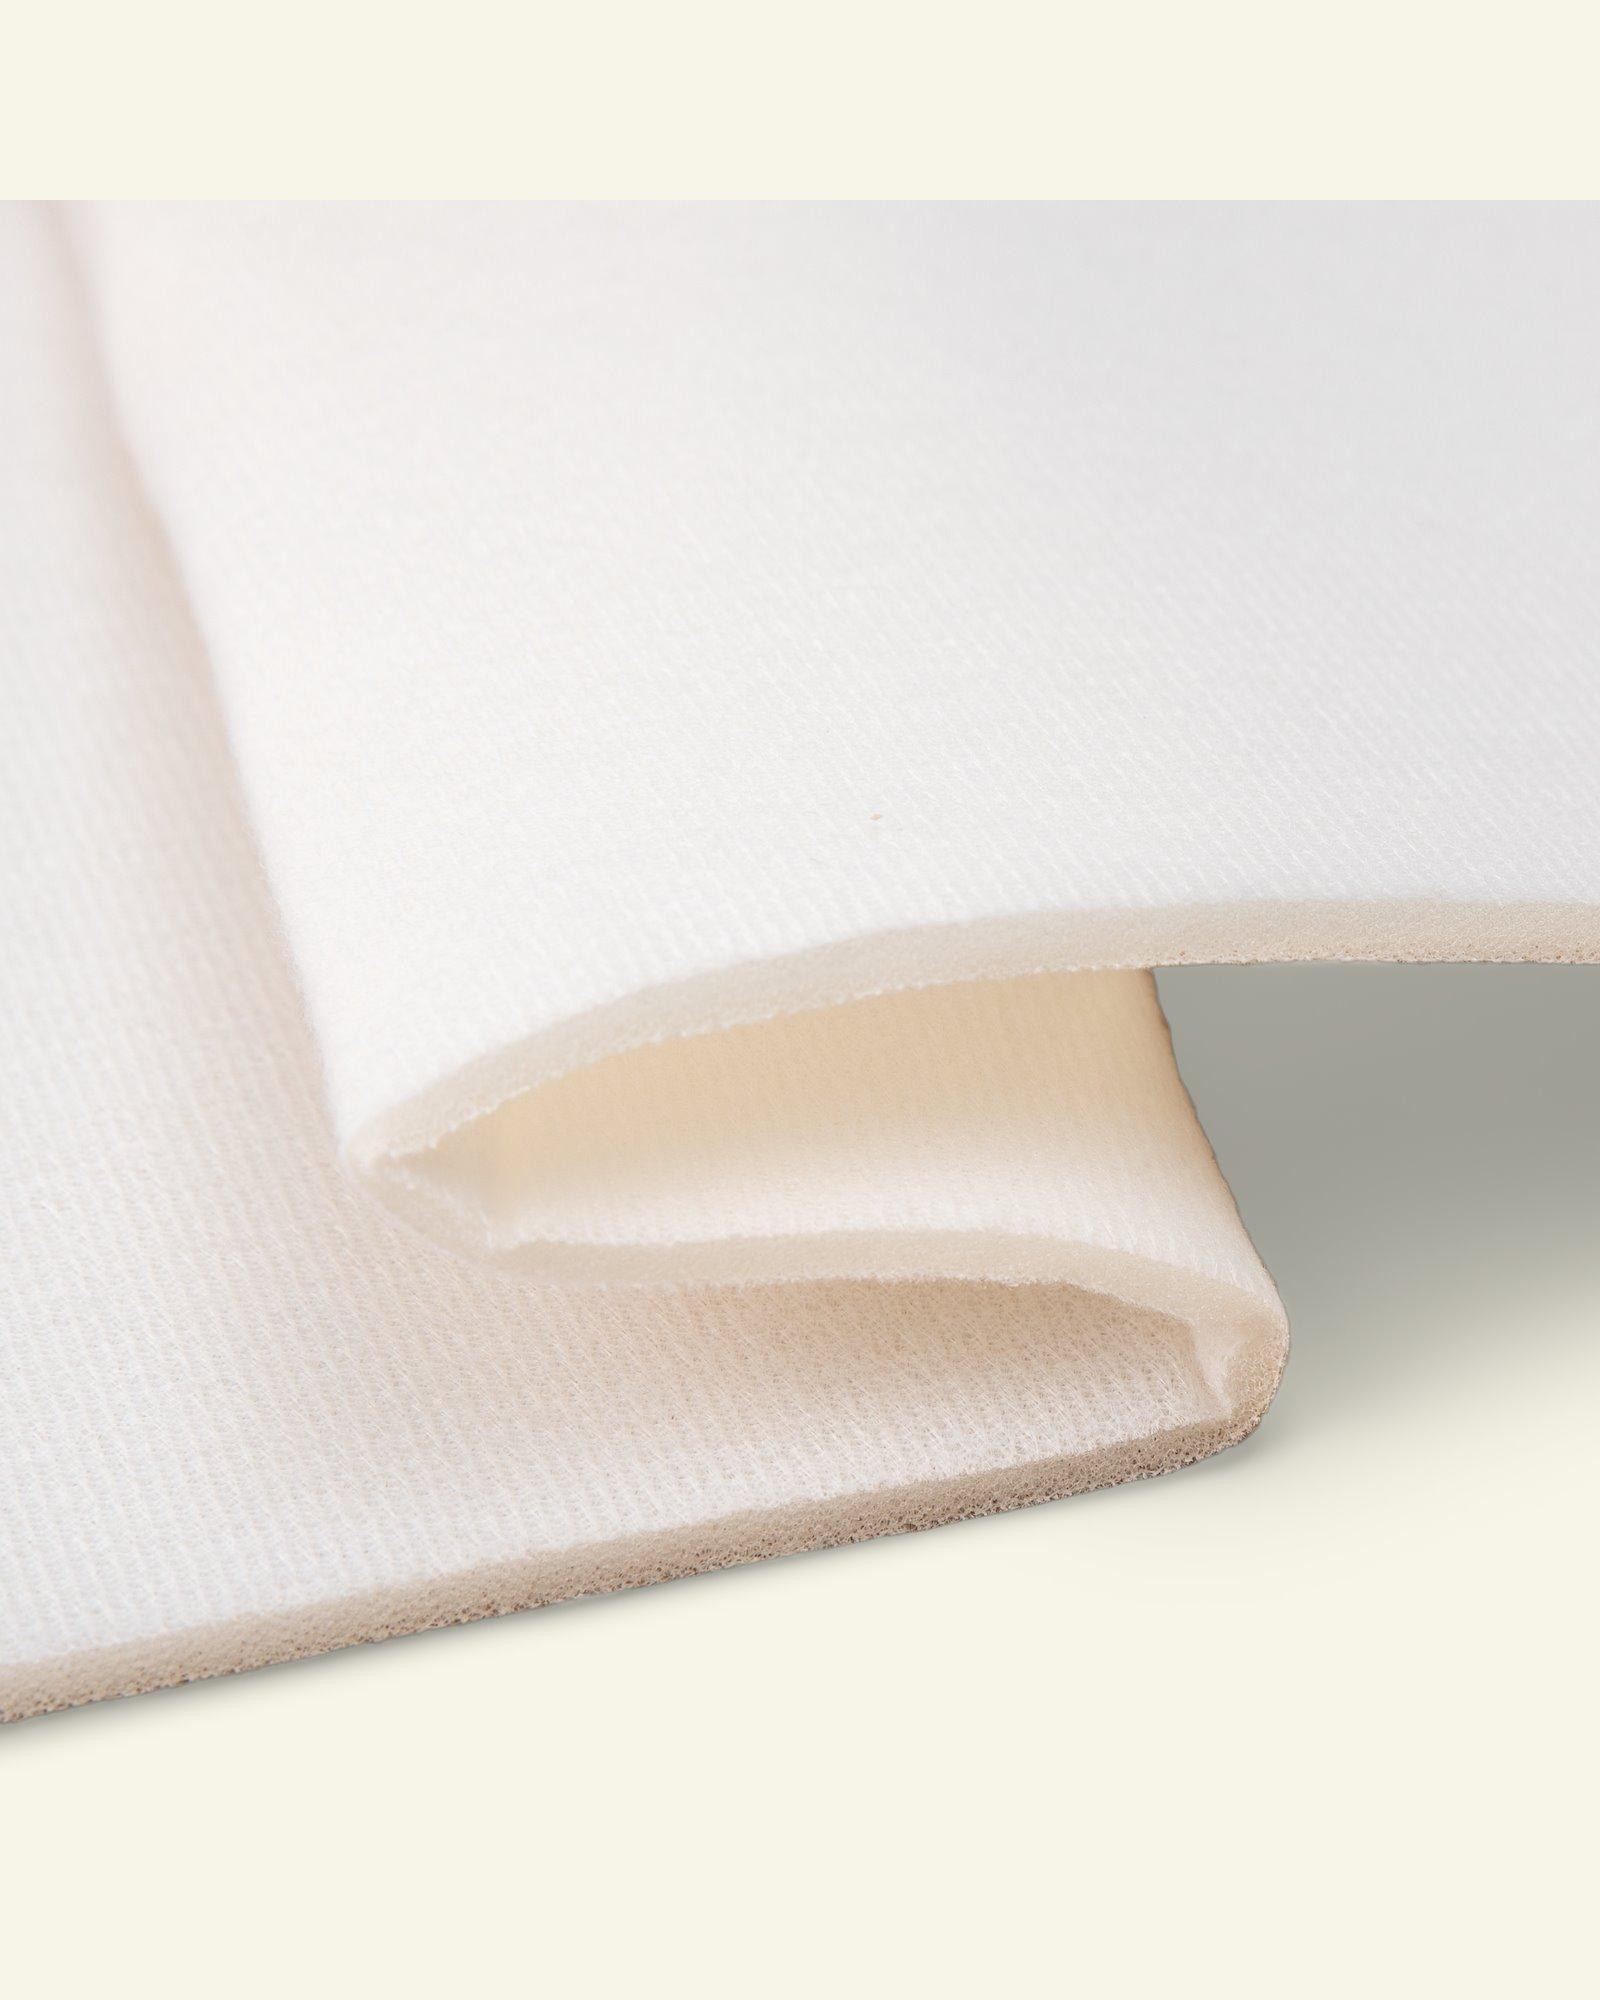 Style-Vil interlining 5mm white